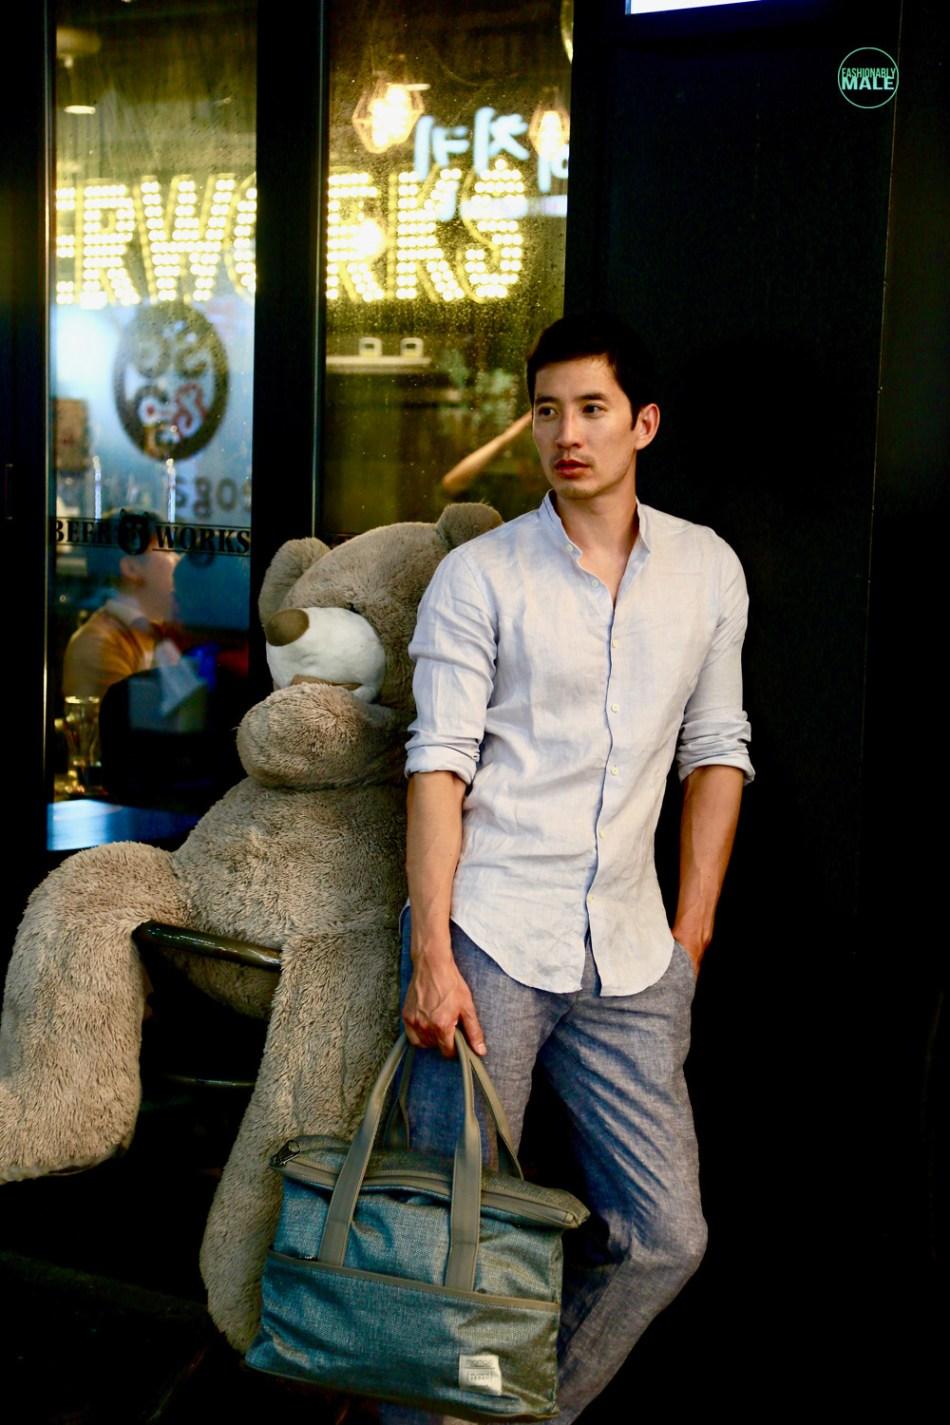 The Night Watchman Richie Kul by Wendy Loke for Fashionably Male1